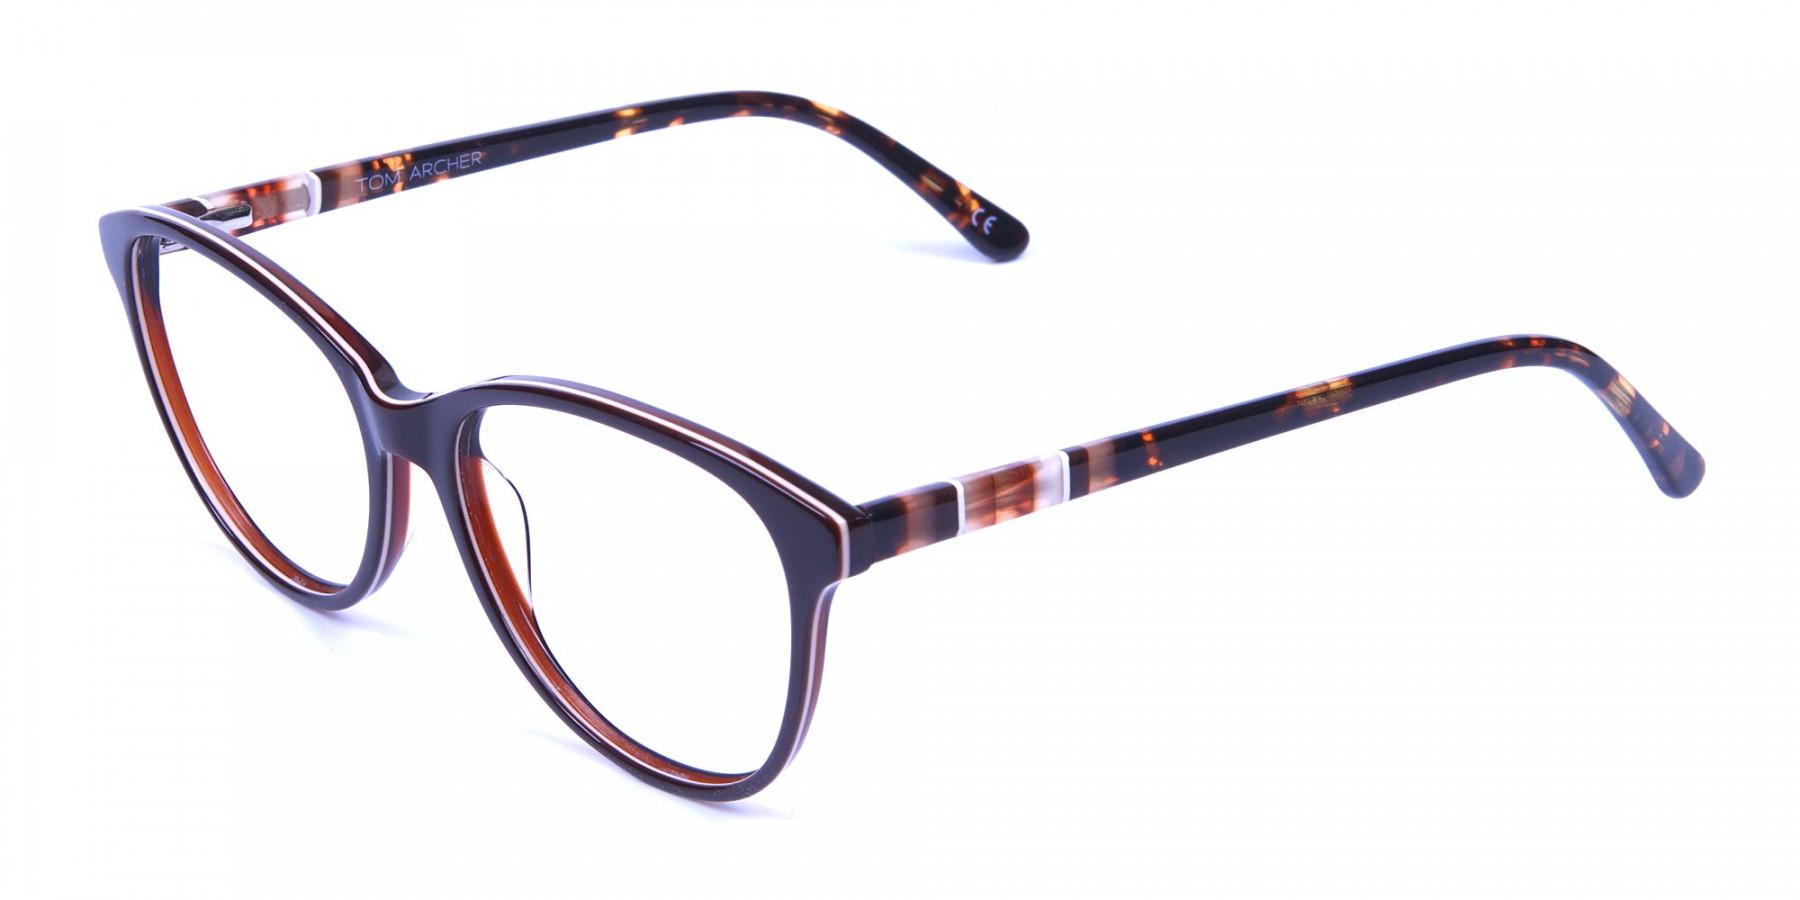 Brown and Tortoiseshell Pattern Glasses